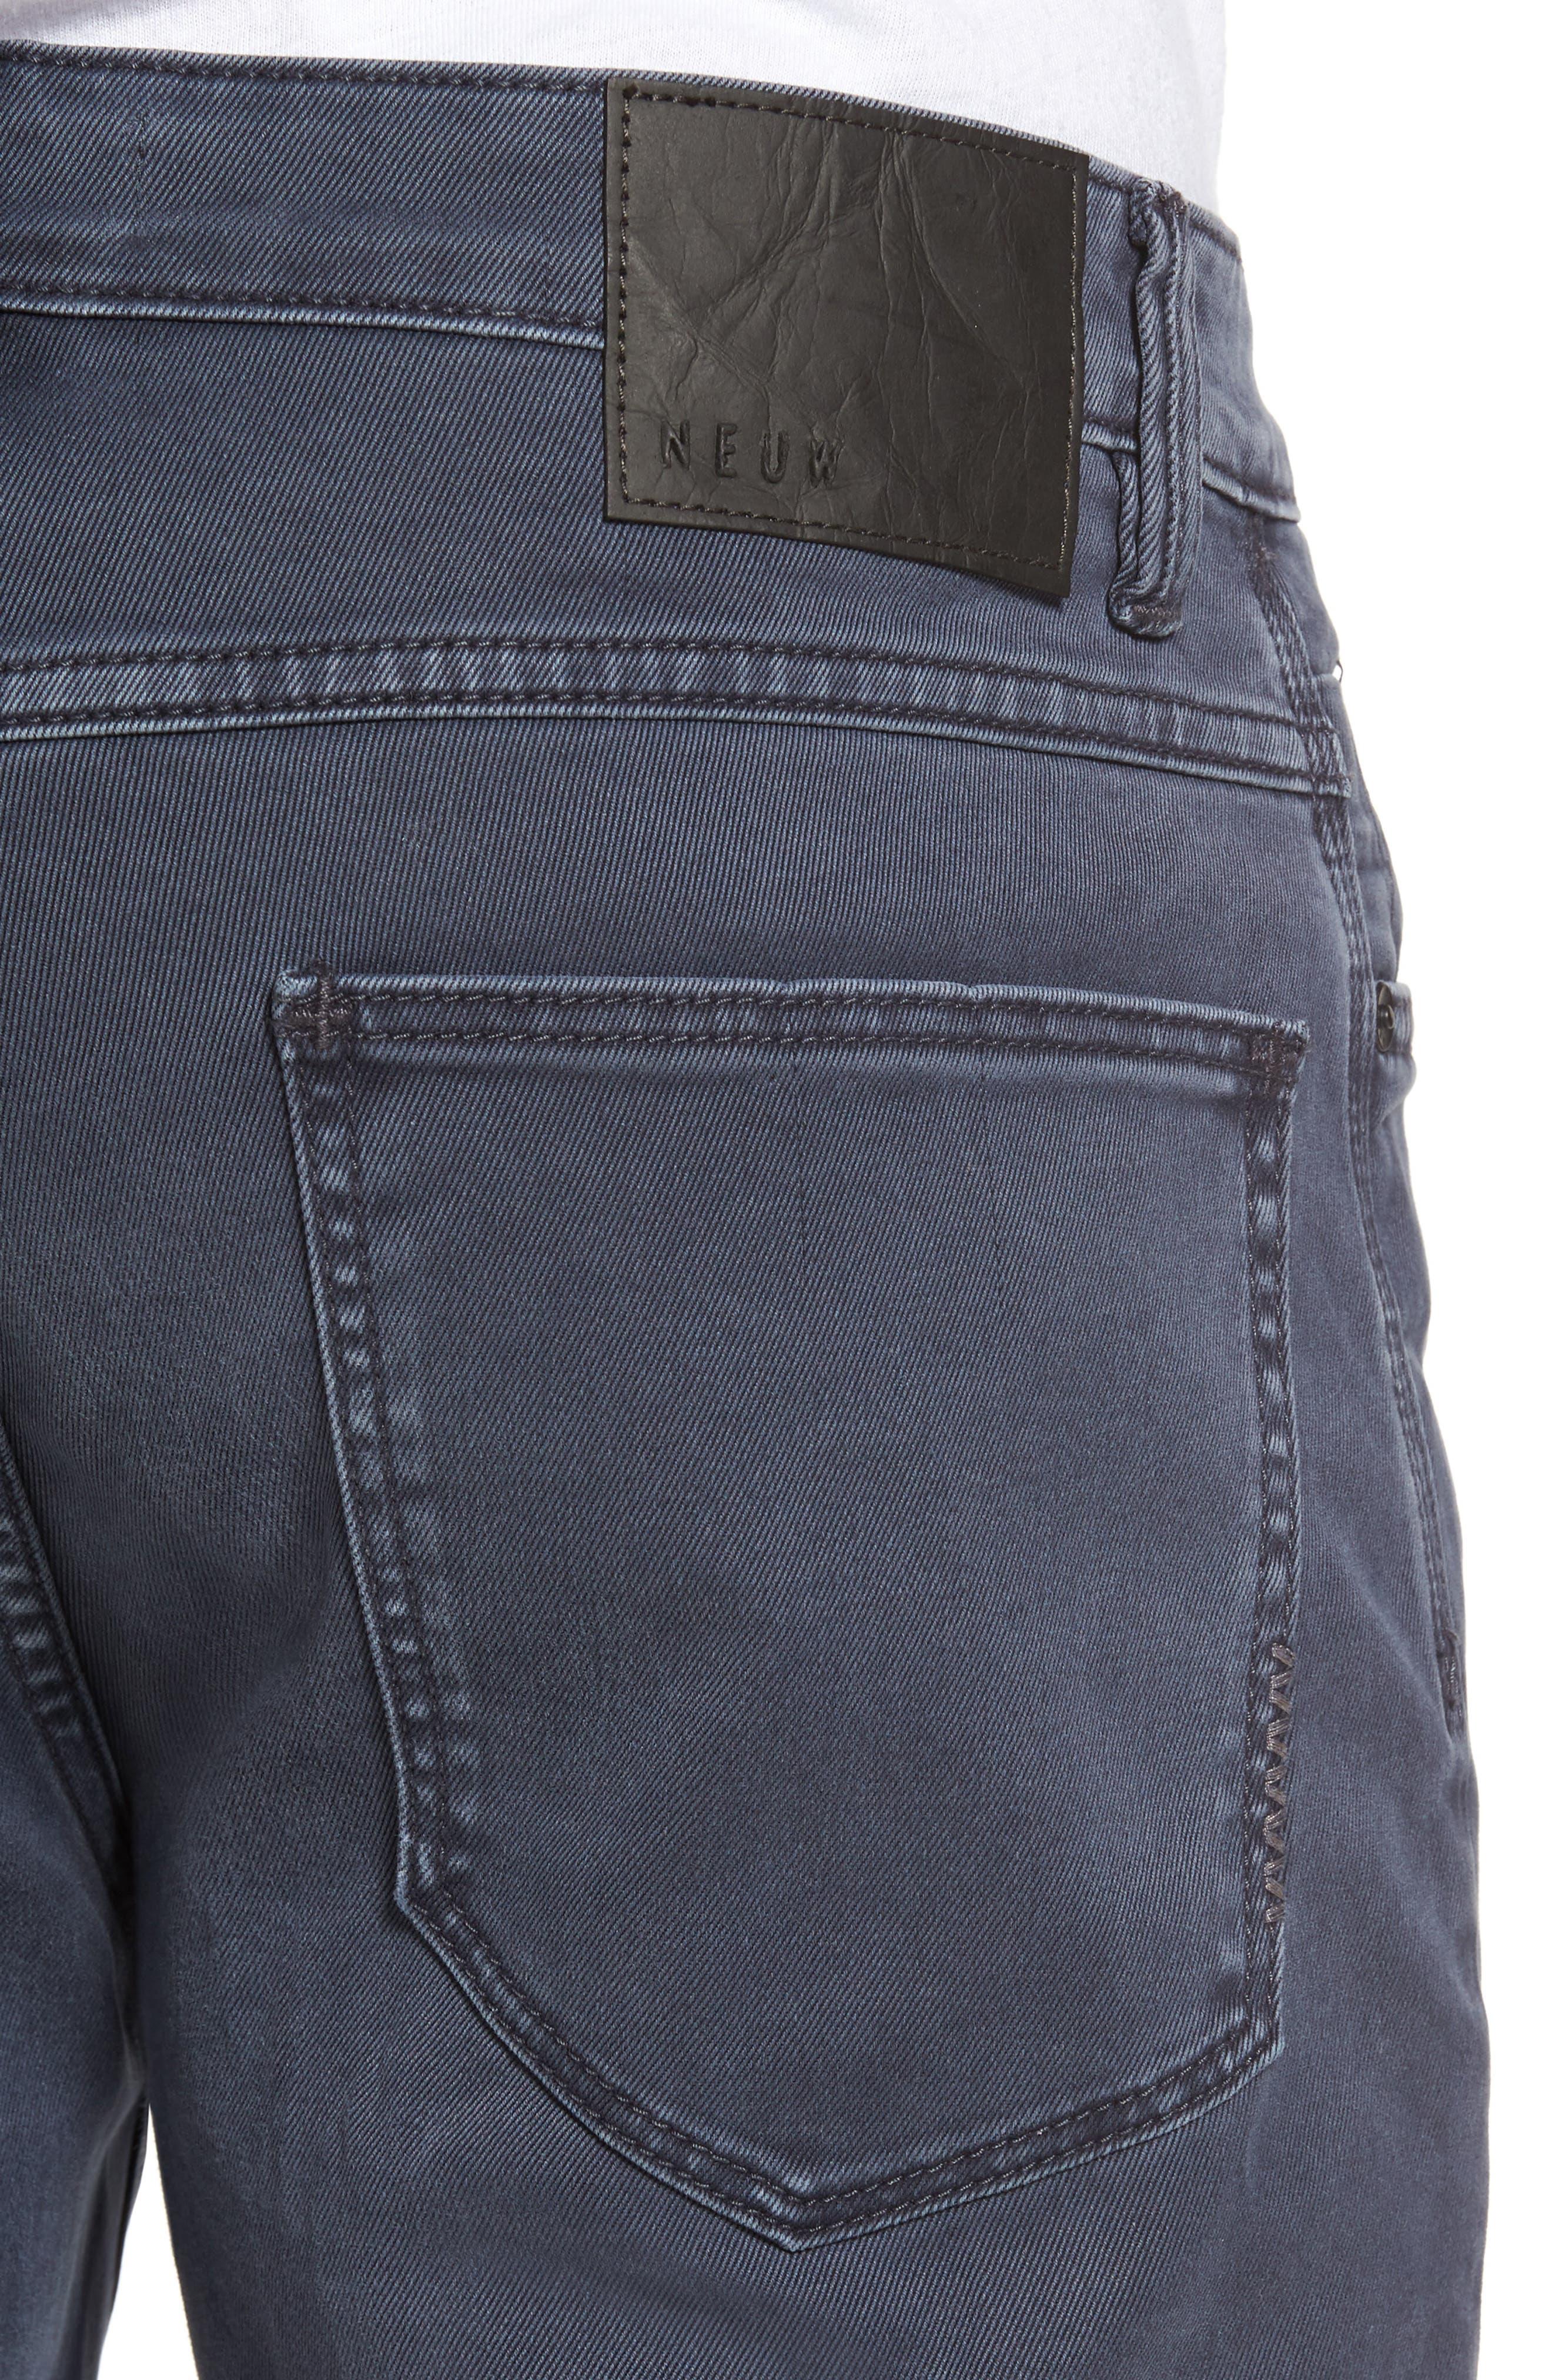 Lou Slim Fit Jeans,                             Alternate thumbnail 4, color,                             LIBERTE